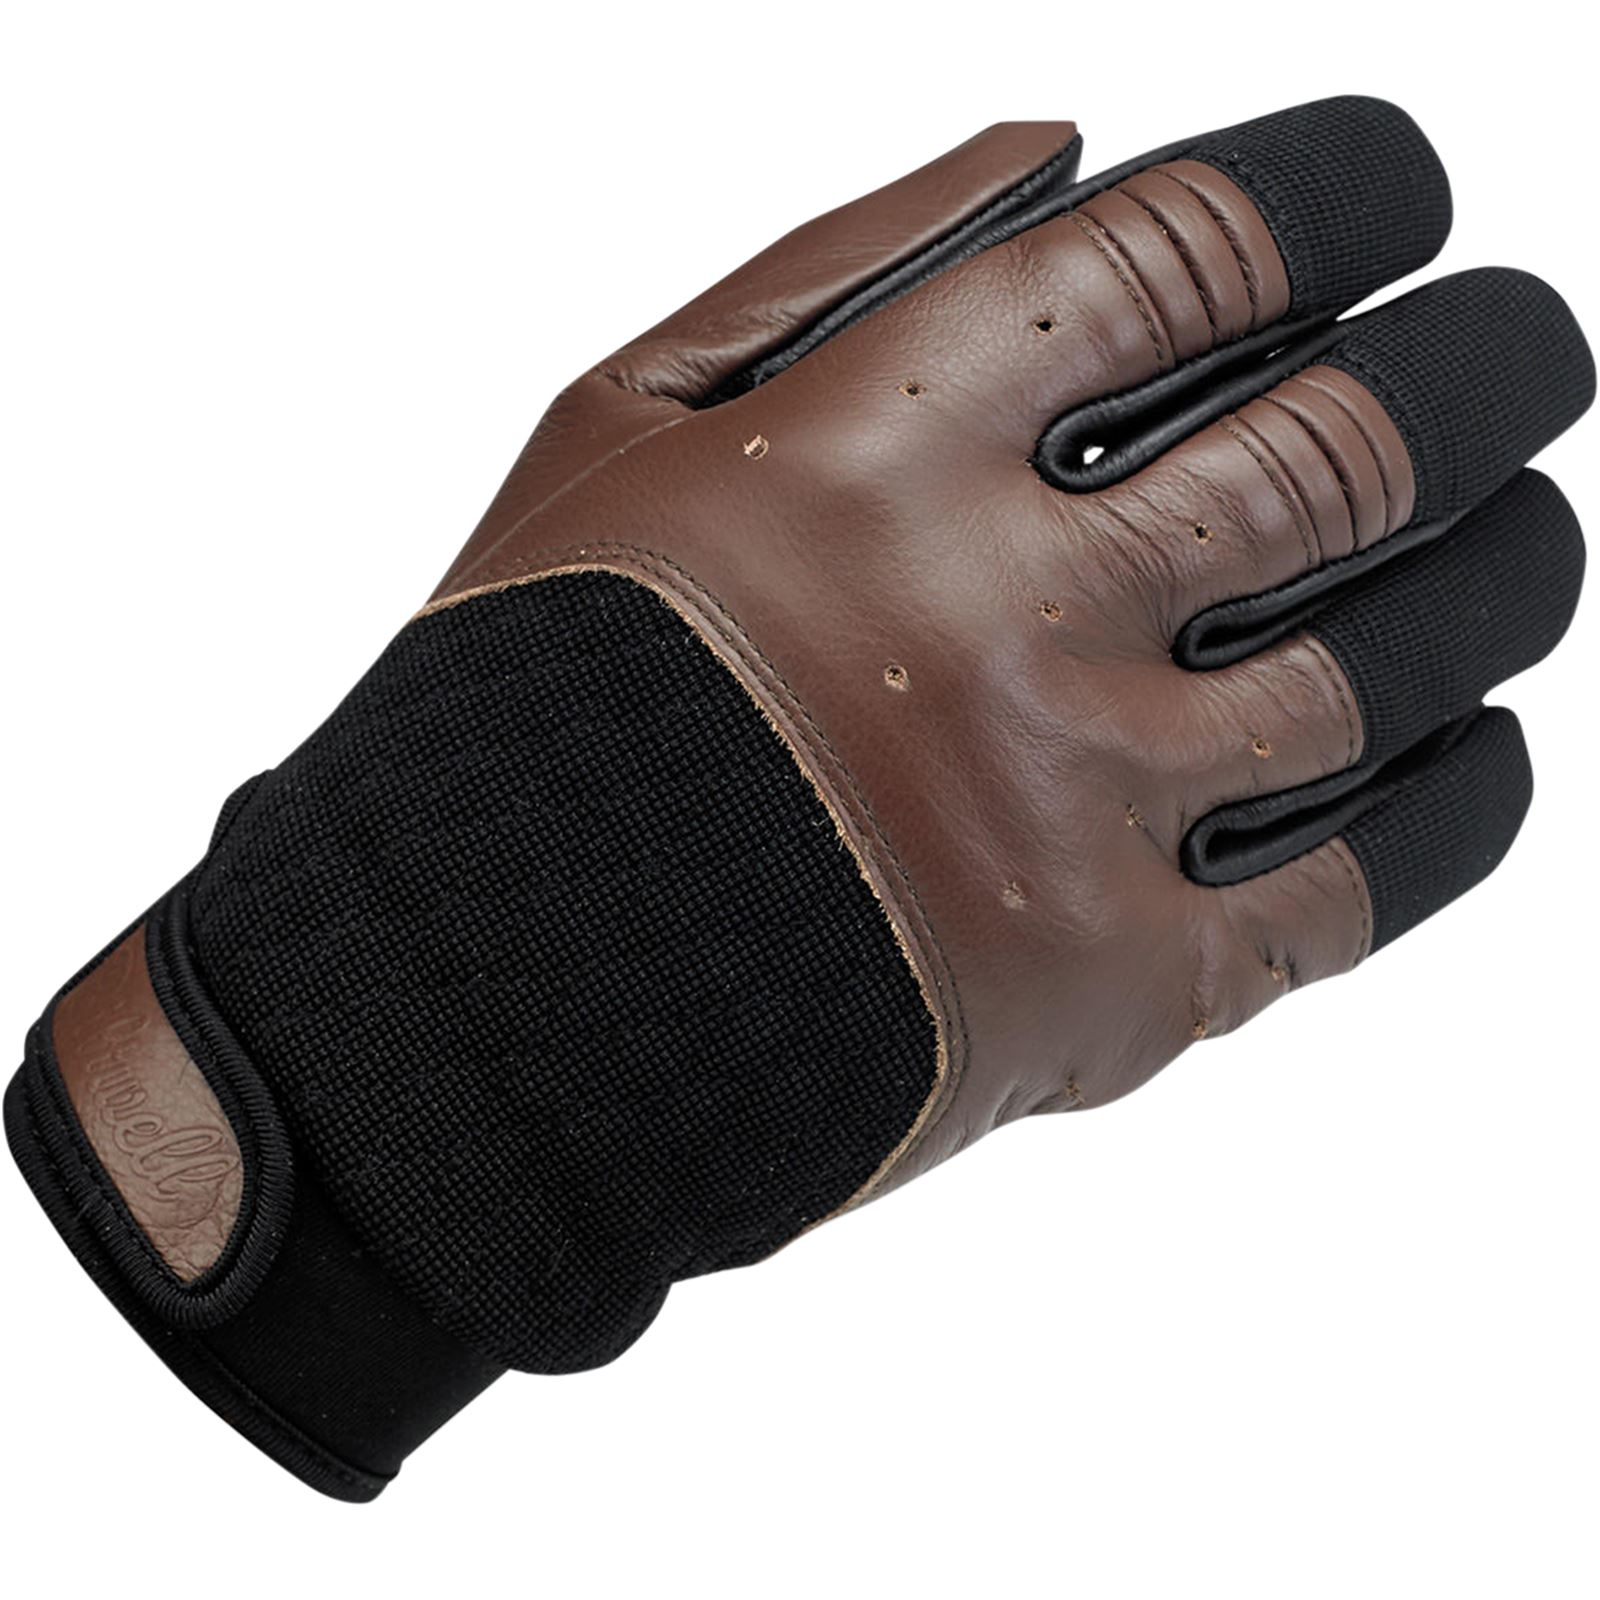 Biltwell Inc. Bantam Gloves - Chocolate/Black - Small